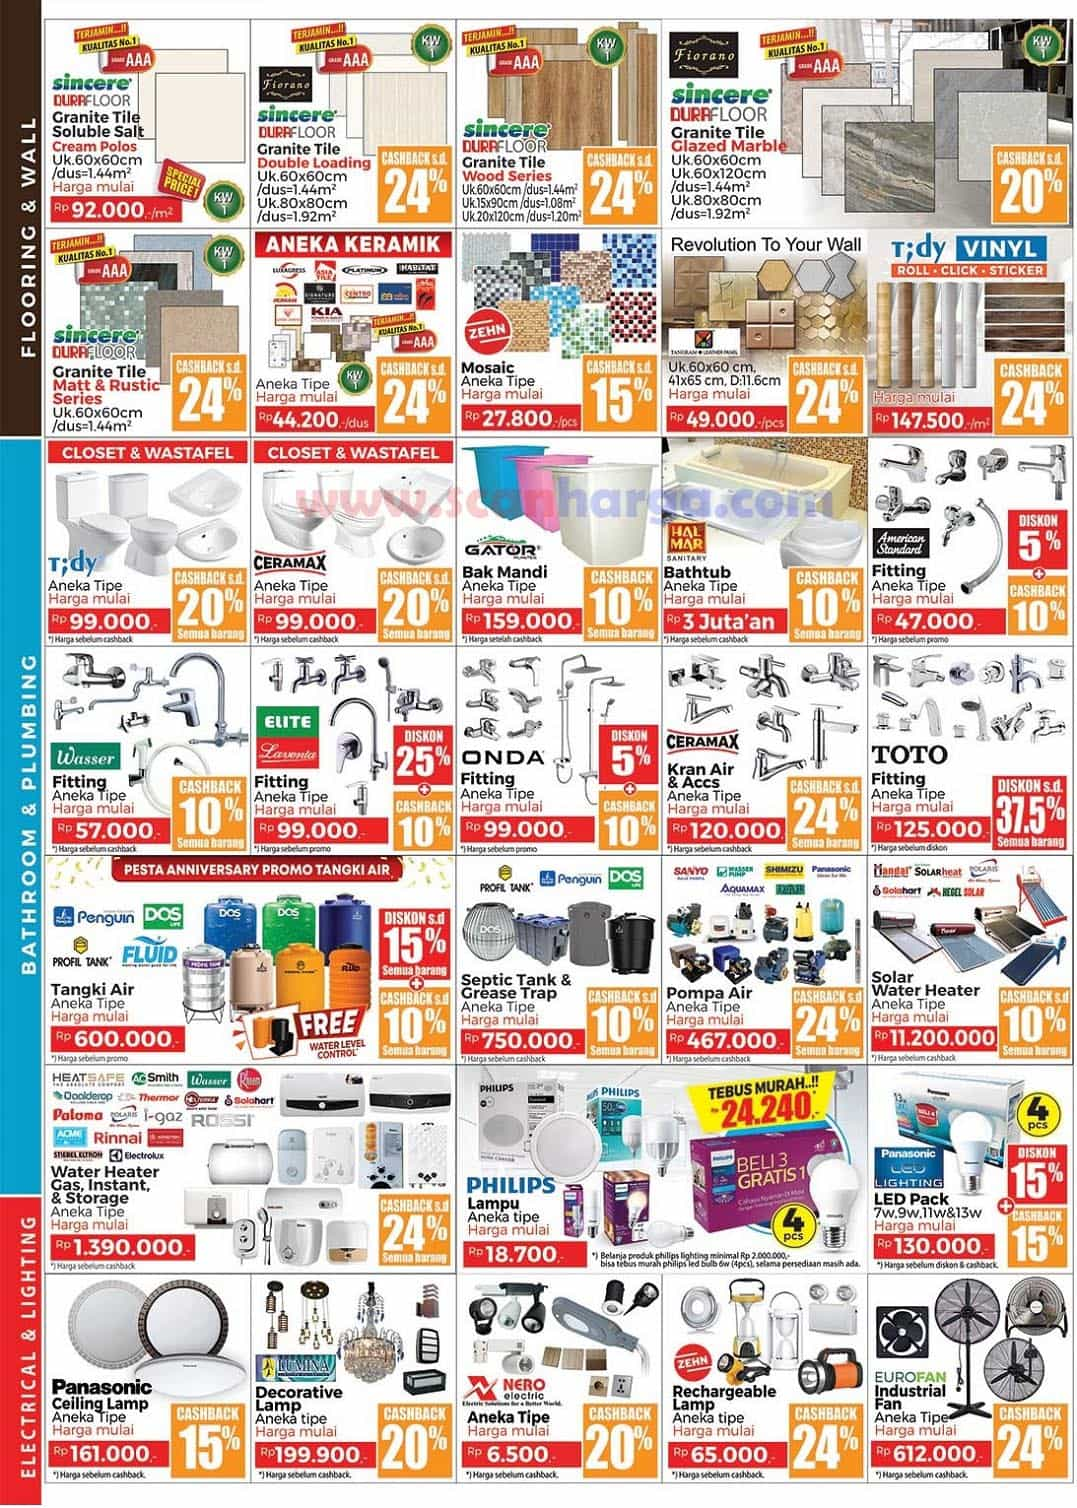 Katalog Promo MITRA 10 Terbaru 1 Maret - 4 April 2021 2